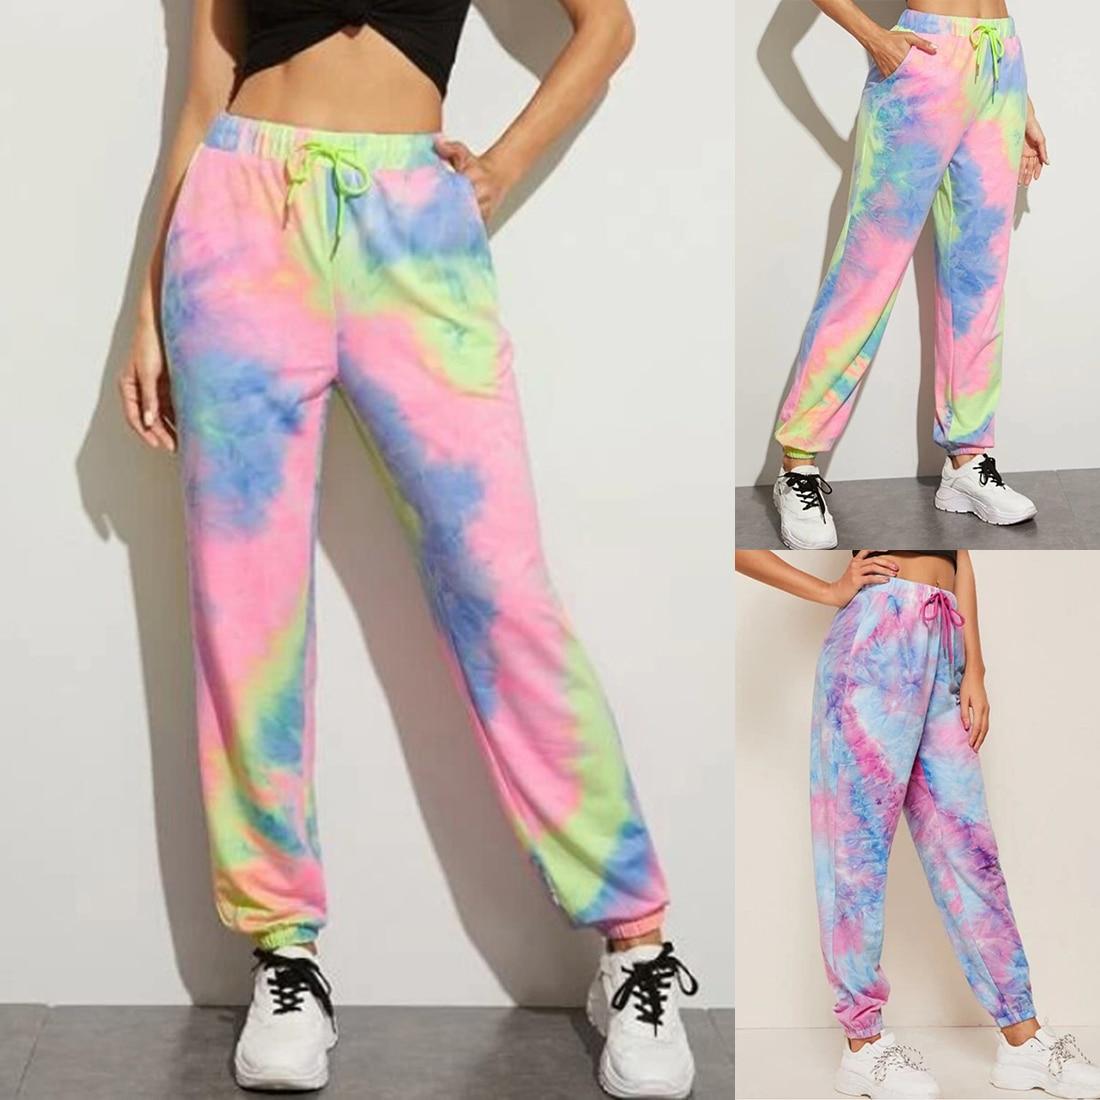 Puimentiua Tie Dye Printed Sweatpants Women Casual Loose Long Trousers Elastic High Waist Pants Capris Joggers Streetwear